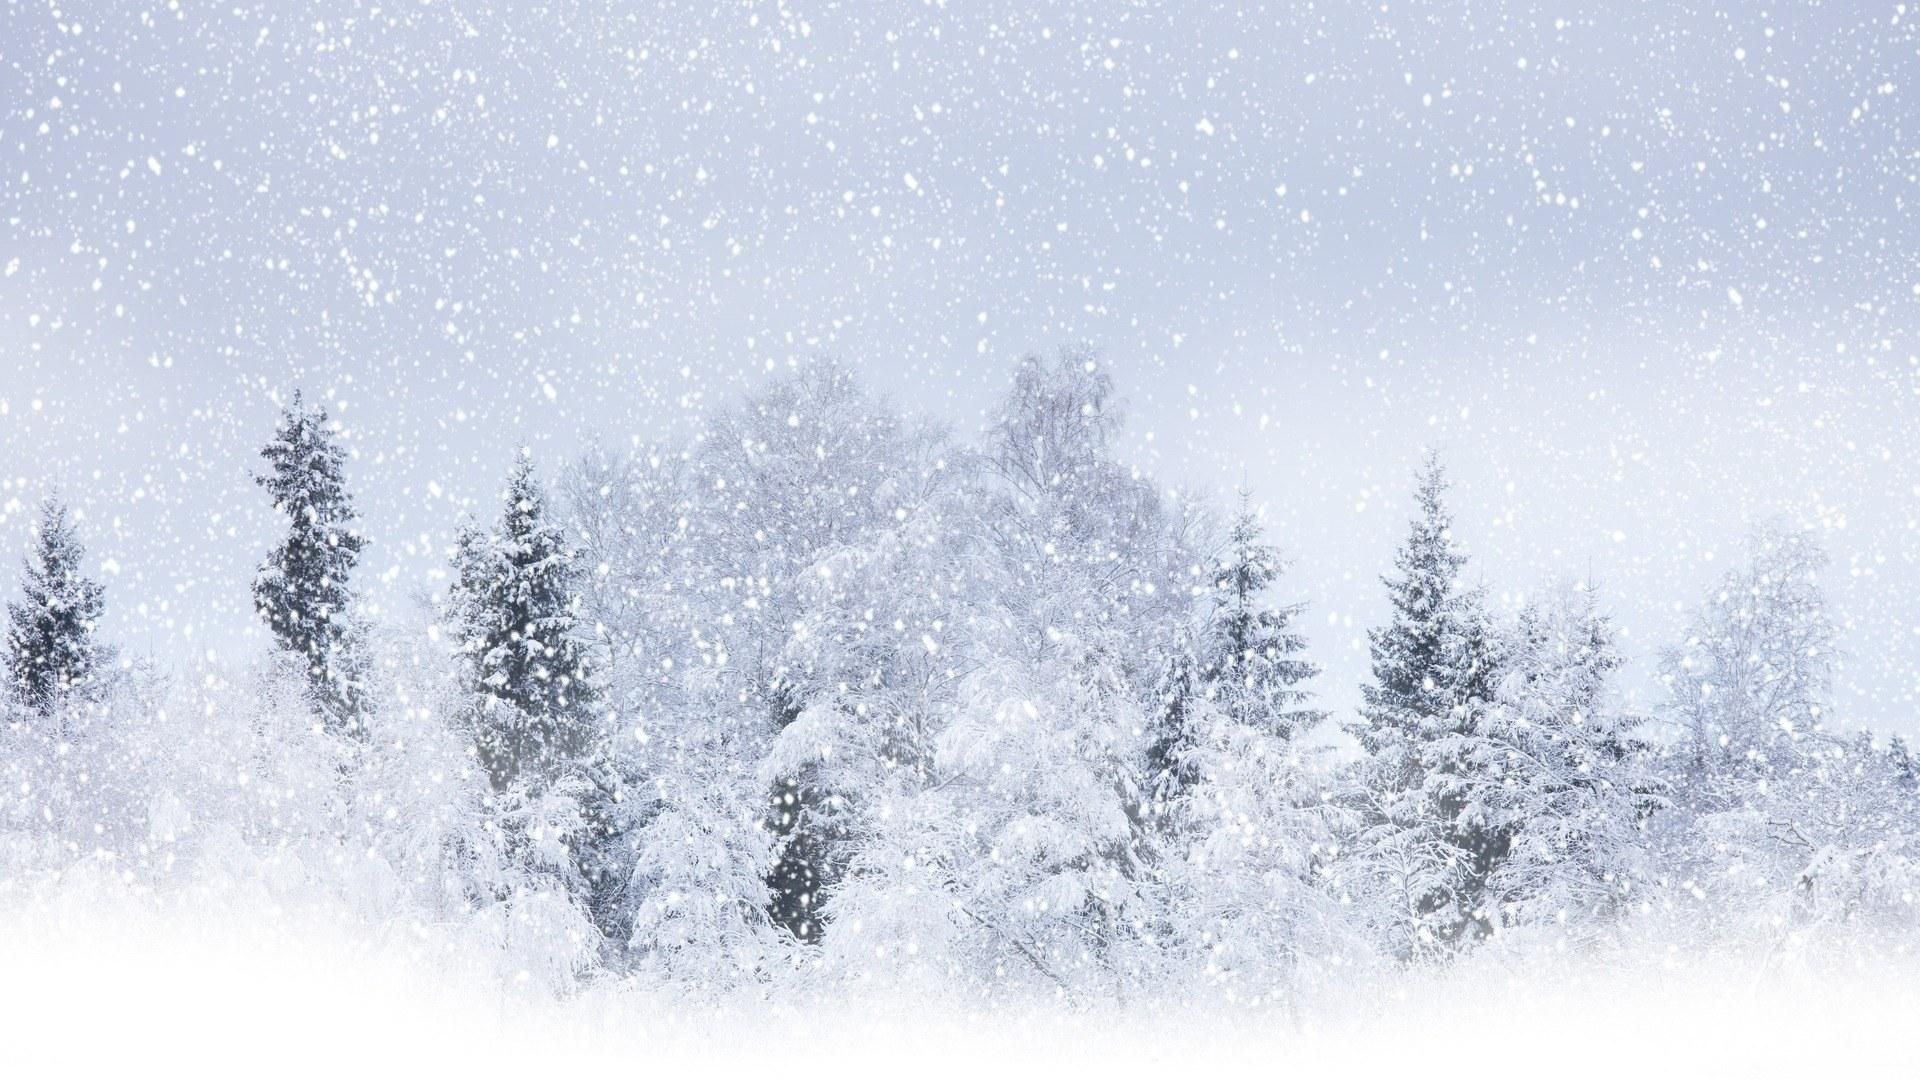 Snowfall Live Wallpaper For Windows 10